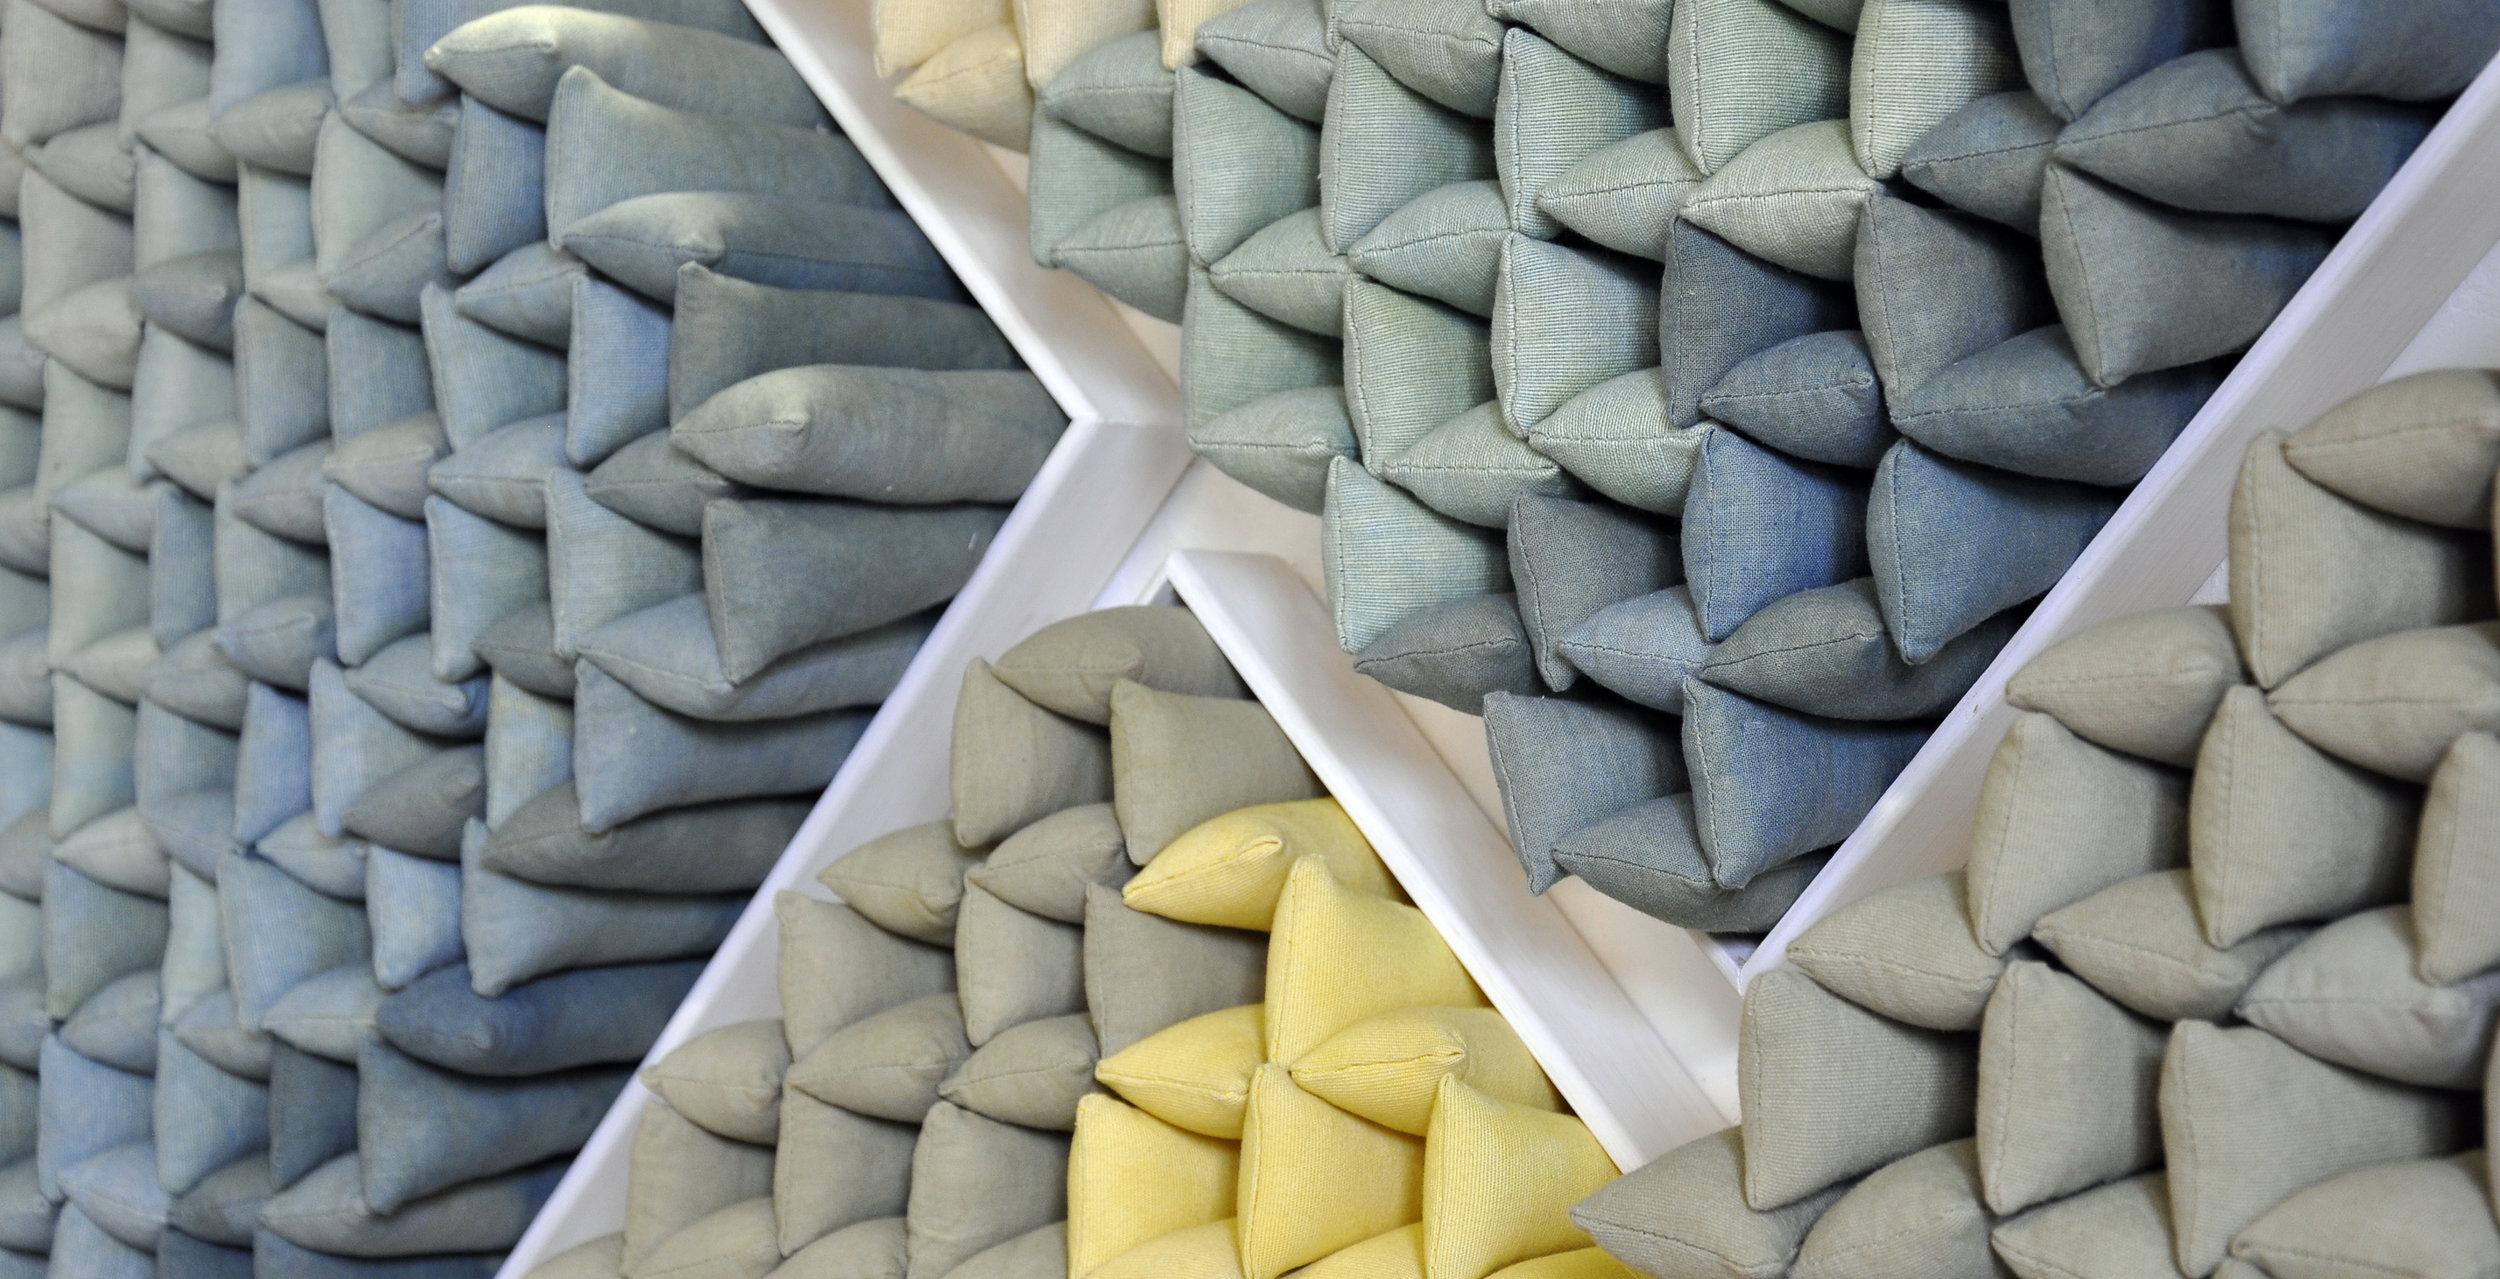 Quadriptych (1000 pillows), 2018 - detail